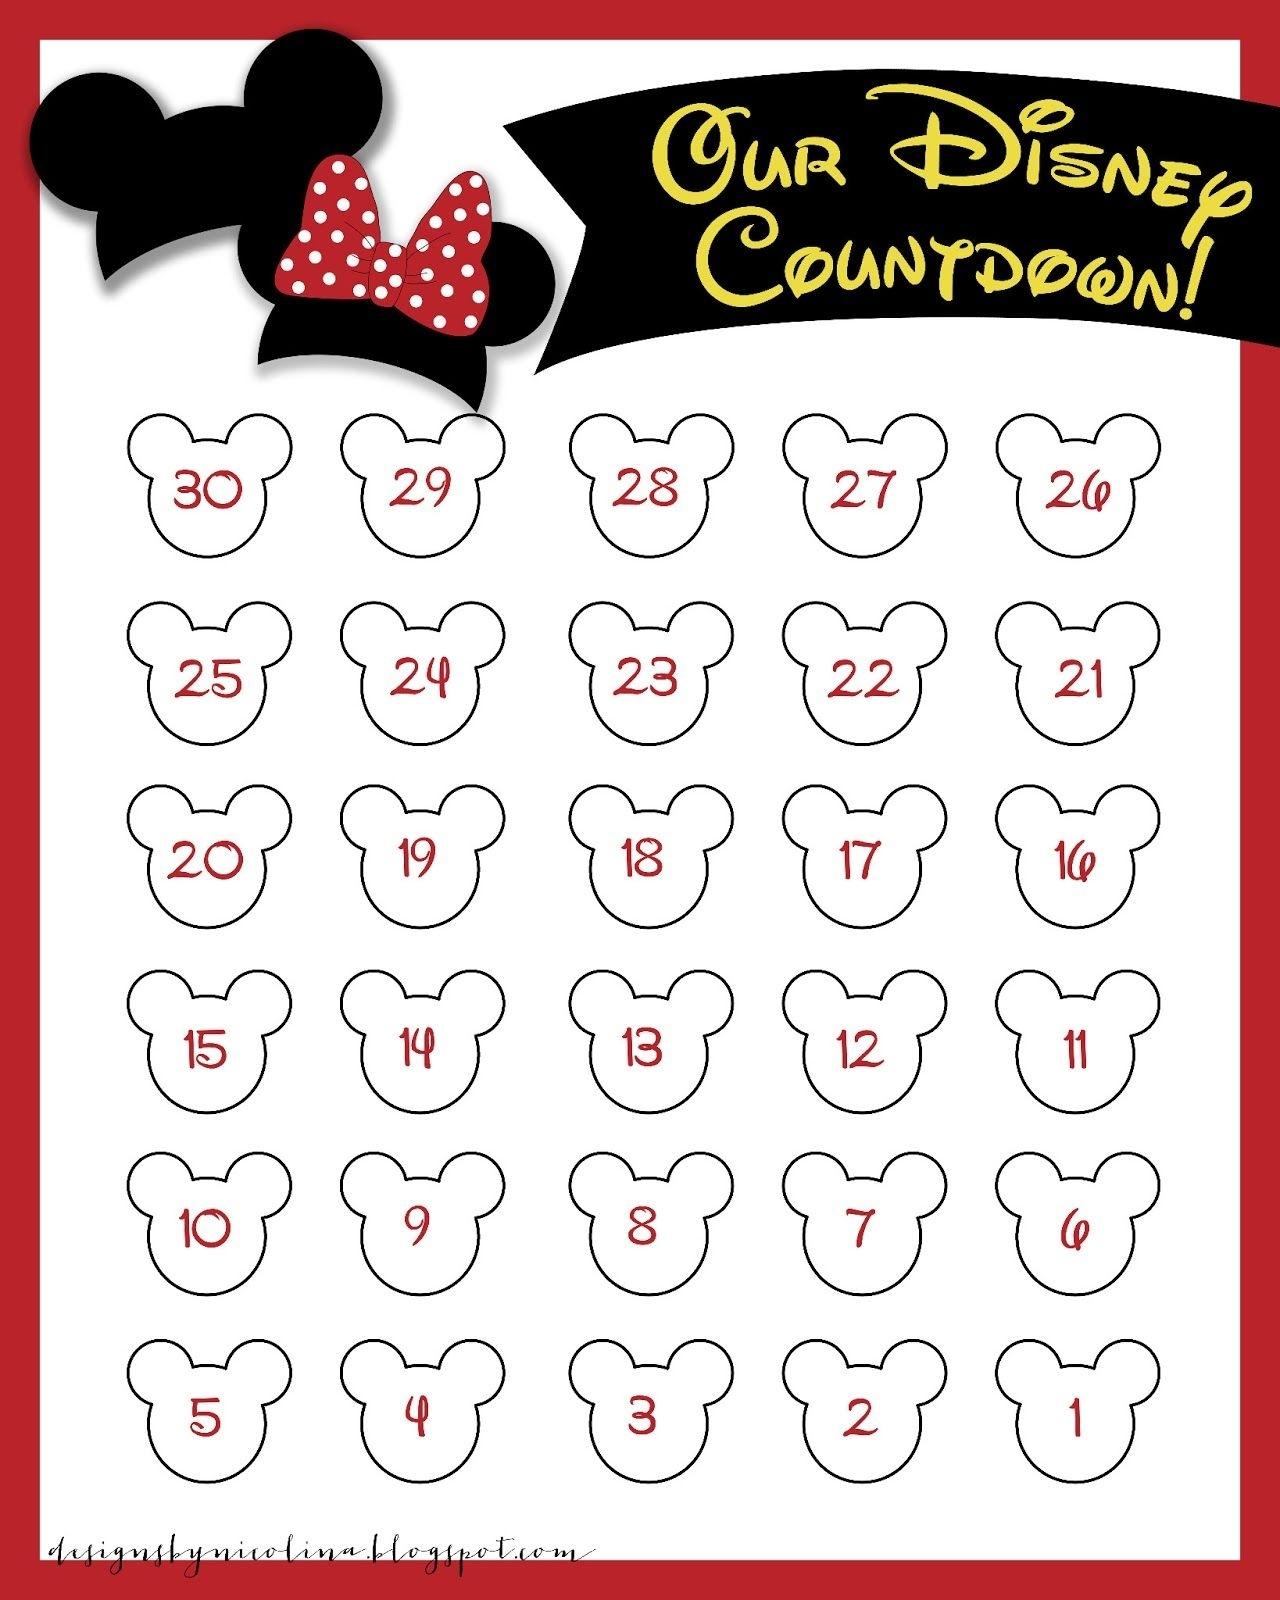 Disneyland Countdown Calendar | Designsnicolina: Disney intended for Free Printable Vacation Countdown Calendar